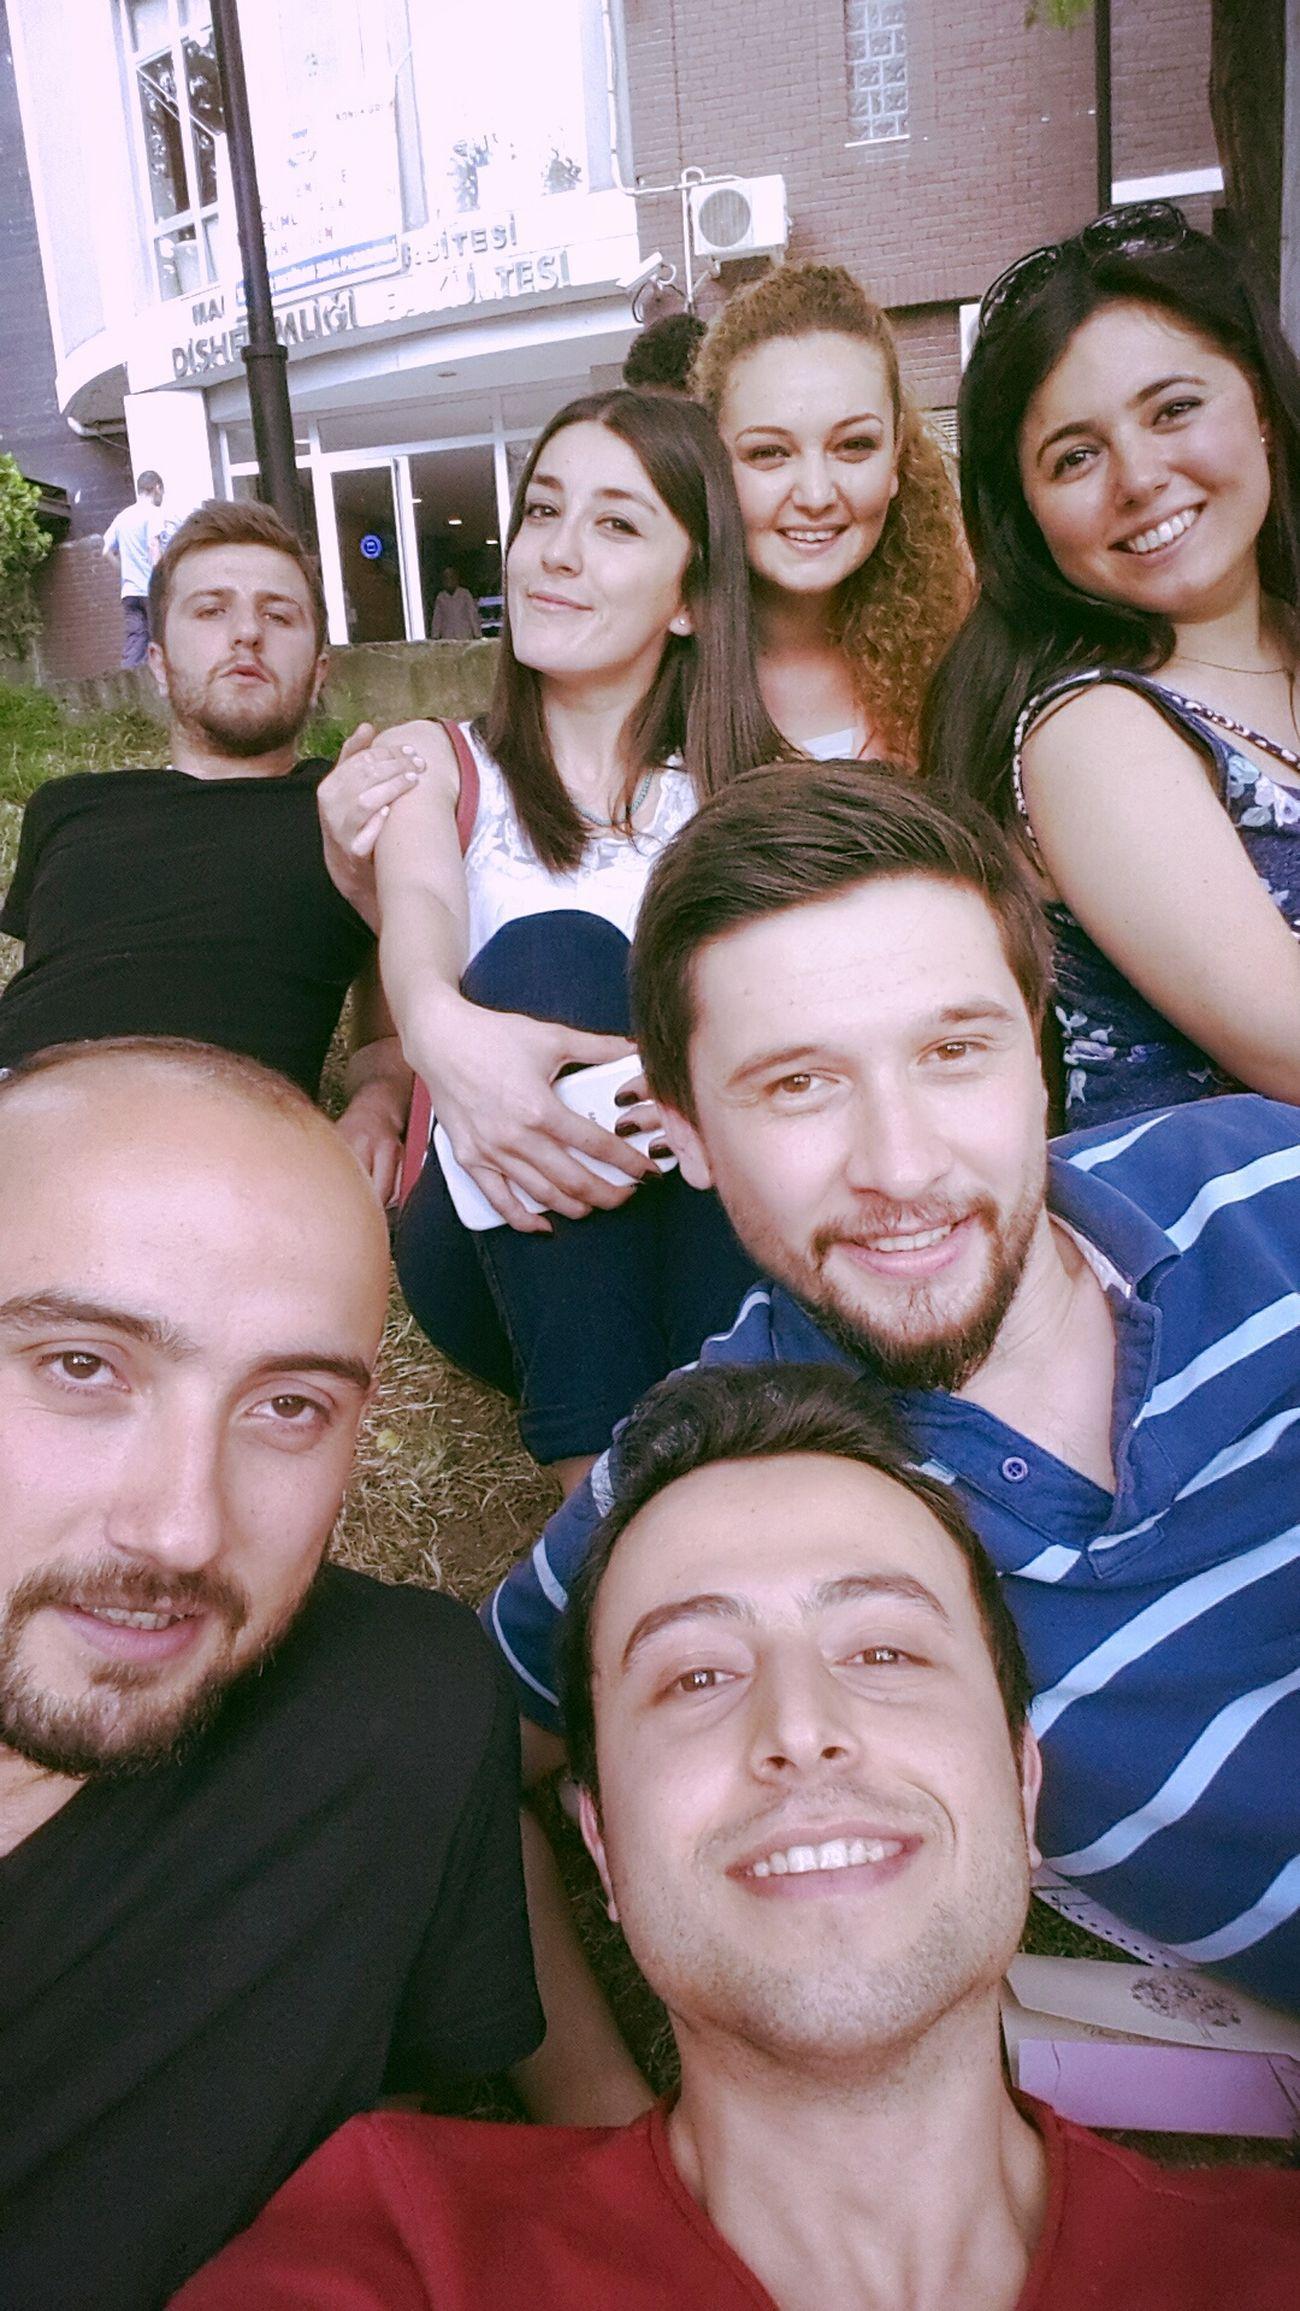 Friends Selfie Enjoying Life Hello World bu üniversitede burada biter =))